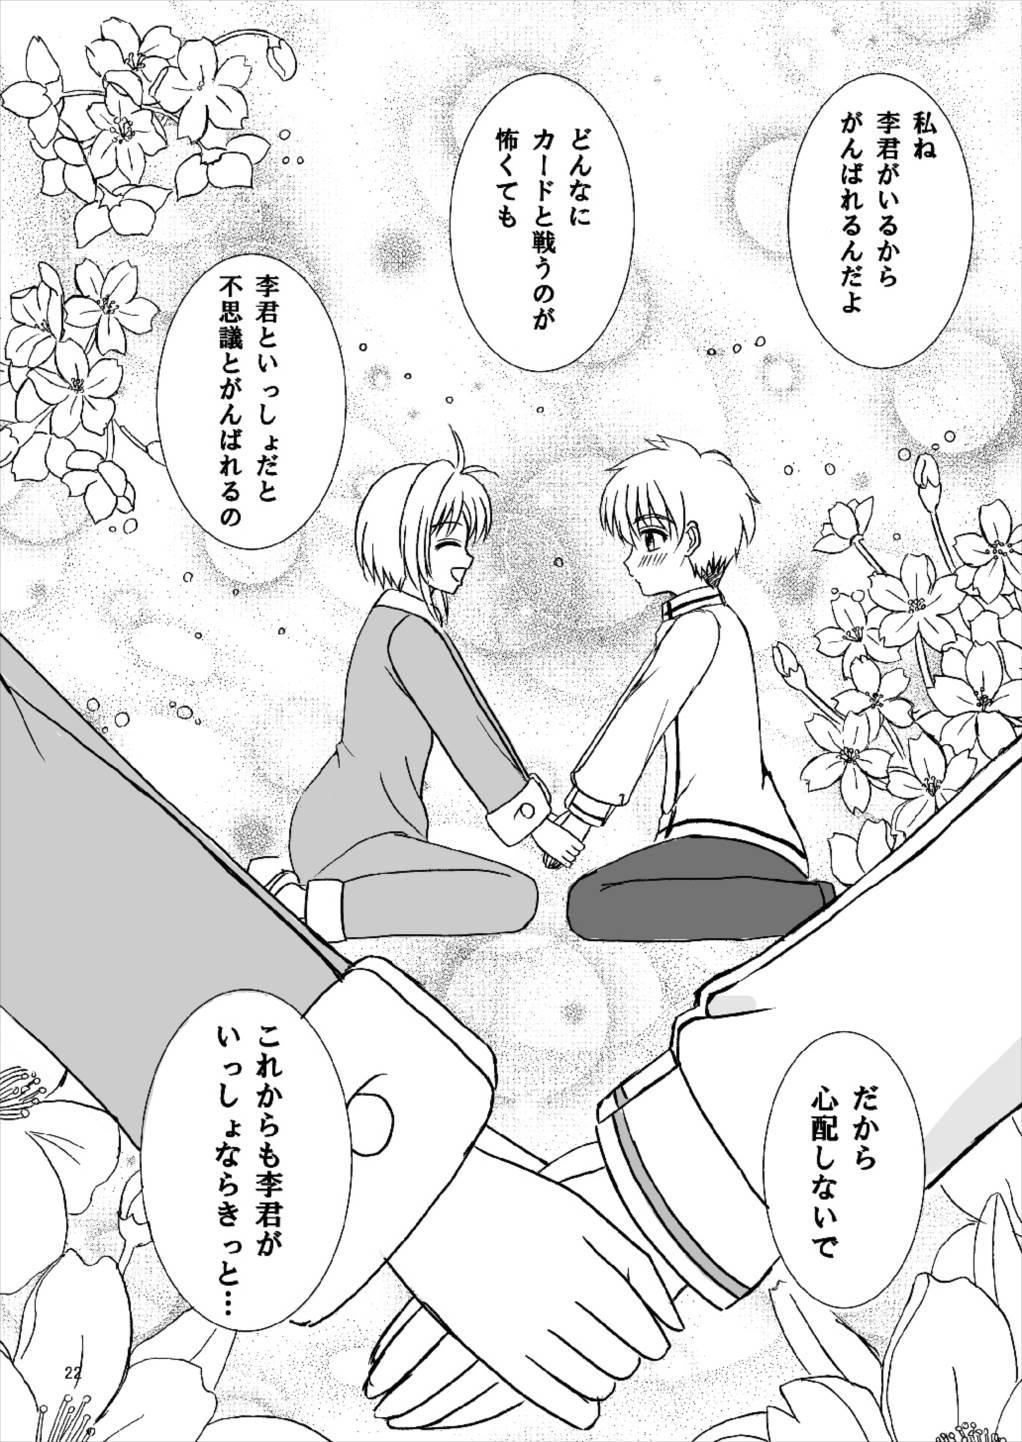 Sakura to Issho! 21